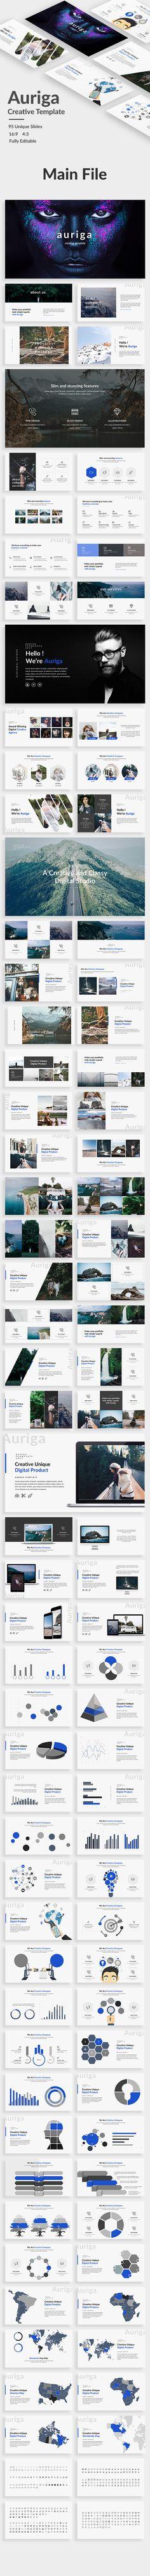 Auriga Creative Keynote Template — Keynote KEY #presentation #corporate • Download ➝ https://graphicriver.net/item/auriga-creative-keynote-template/20212033?ref=pxcr